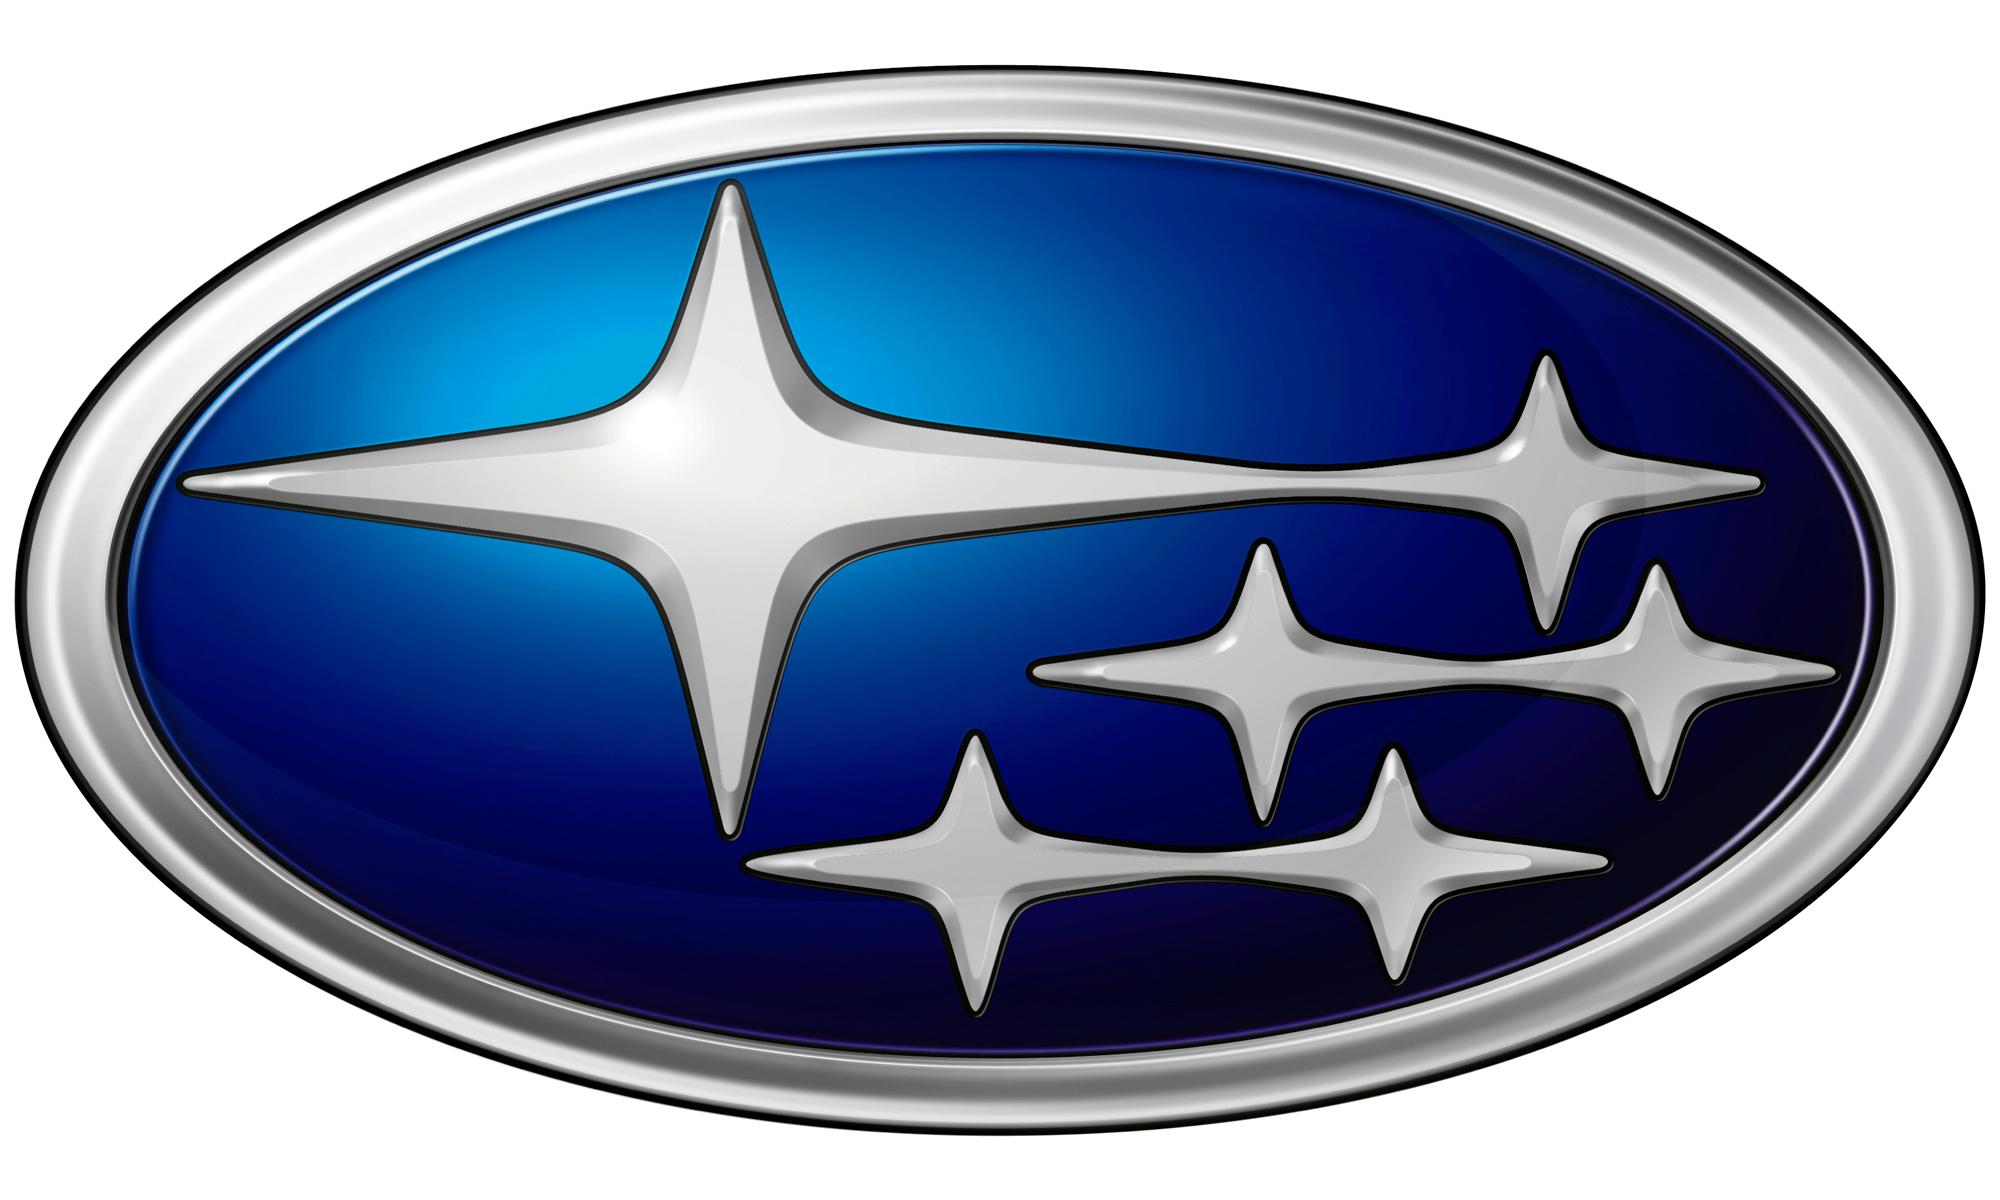 Subaru car logo PNG brand ima